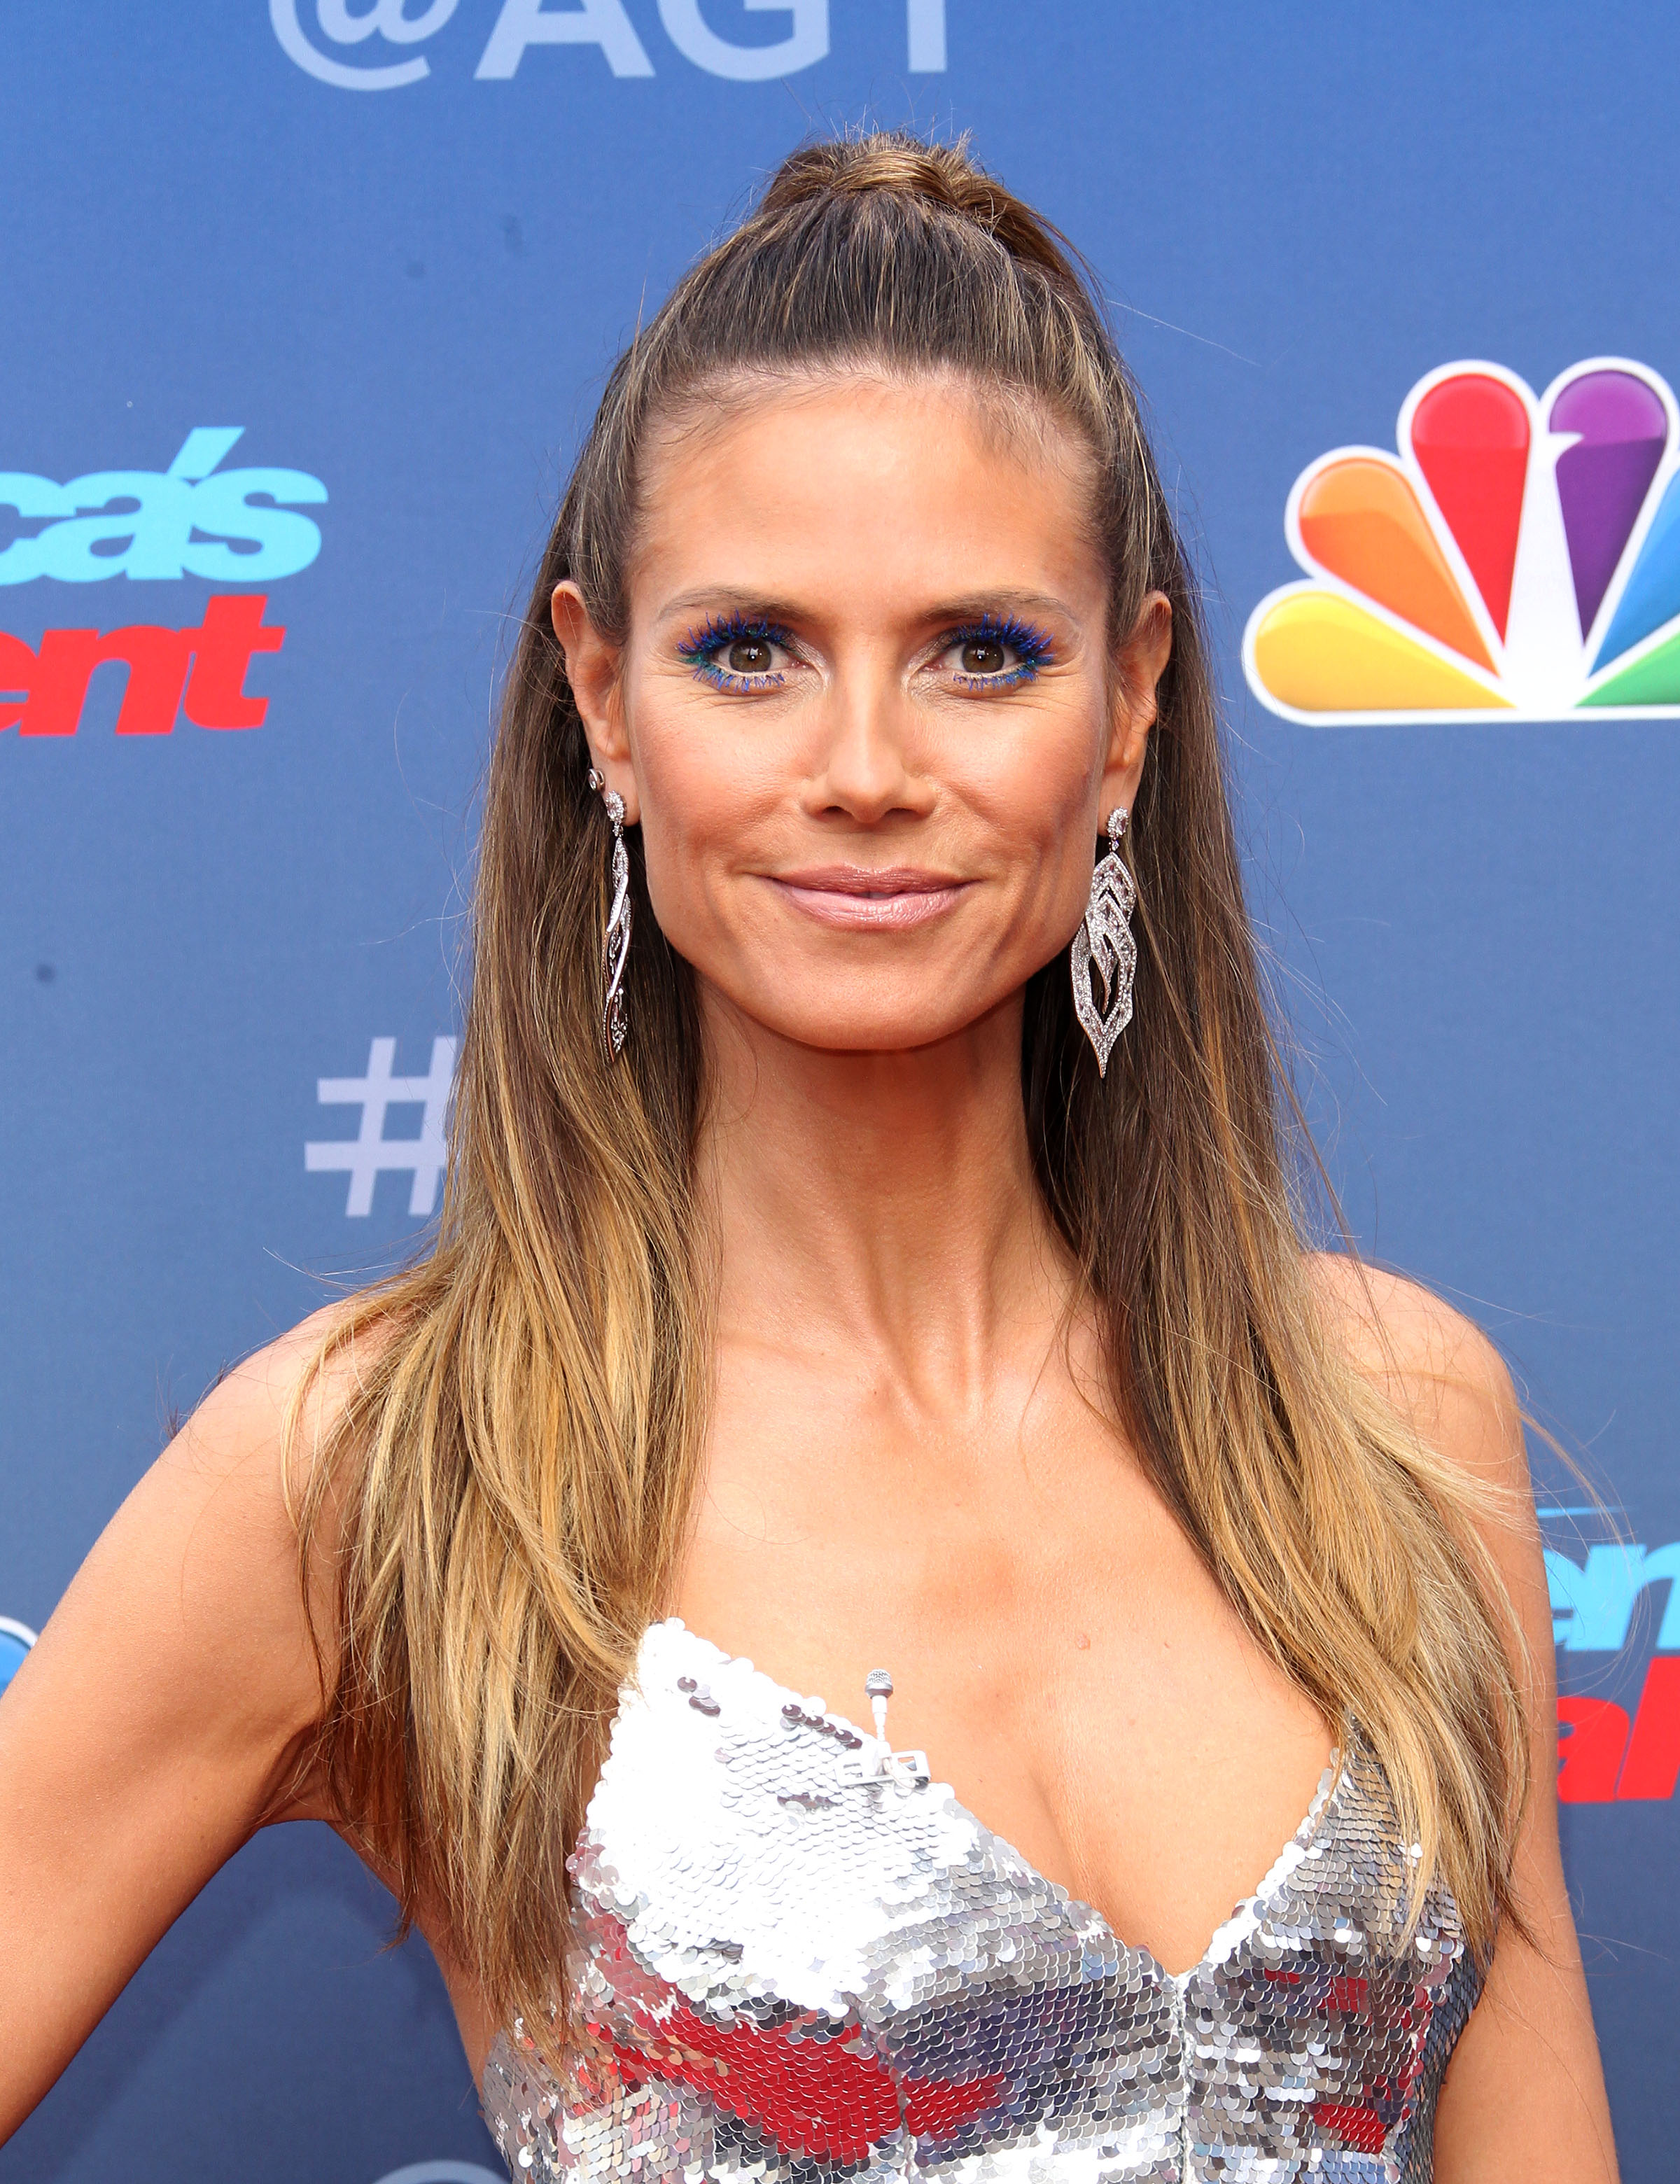 Season 13 America's Got Talent Kickoff - Pasadena <P> Pictured: Heidi Klum <B>Ref: SPL1670783  120318  </B><BR/> Picture by: Jen Lowery / Splash News<BR/> </P><P> <B>Splash News and Pictures</B><BR/> Los Angeles:310-821-2666<BR/> New York:212-619-2666<BR/> London:870-934-2666<BR/> <span id=